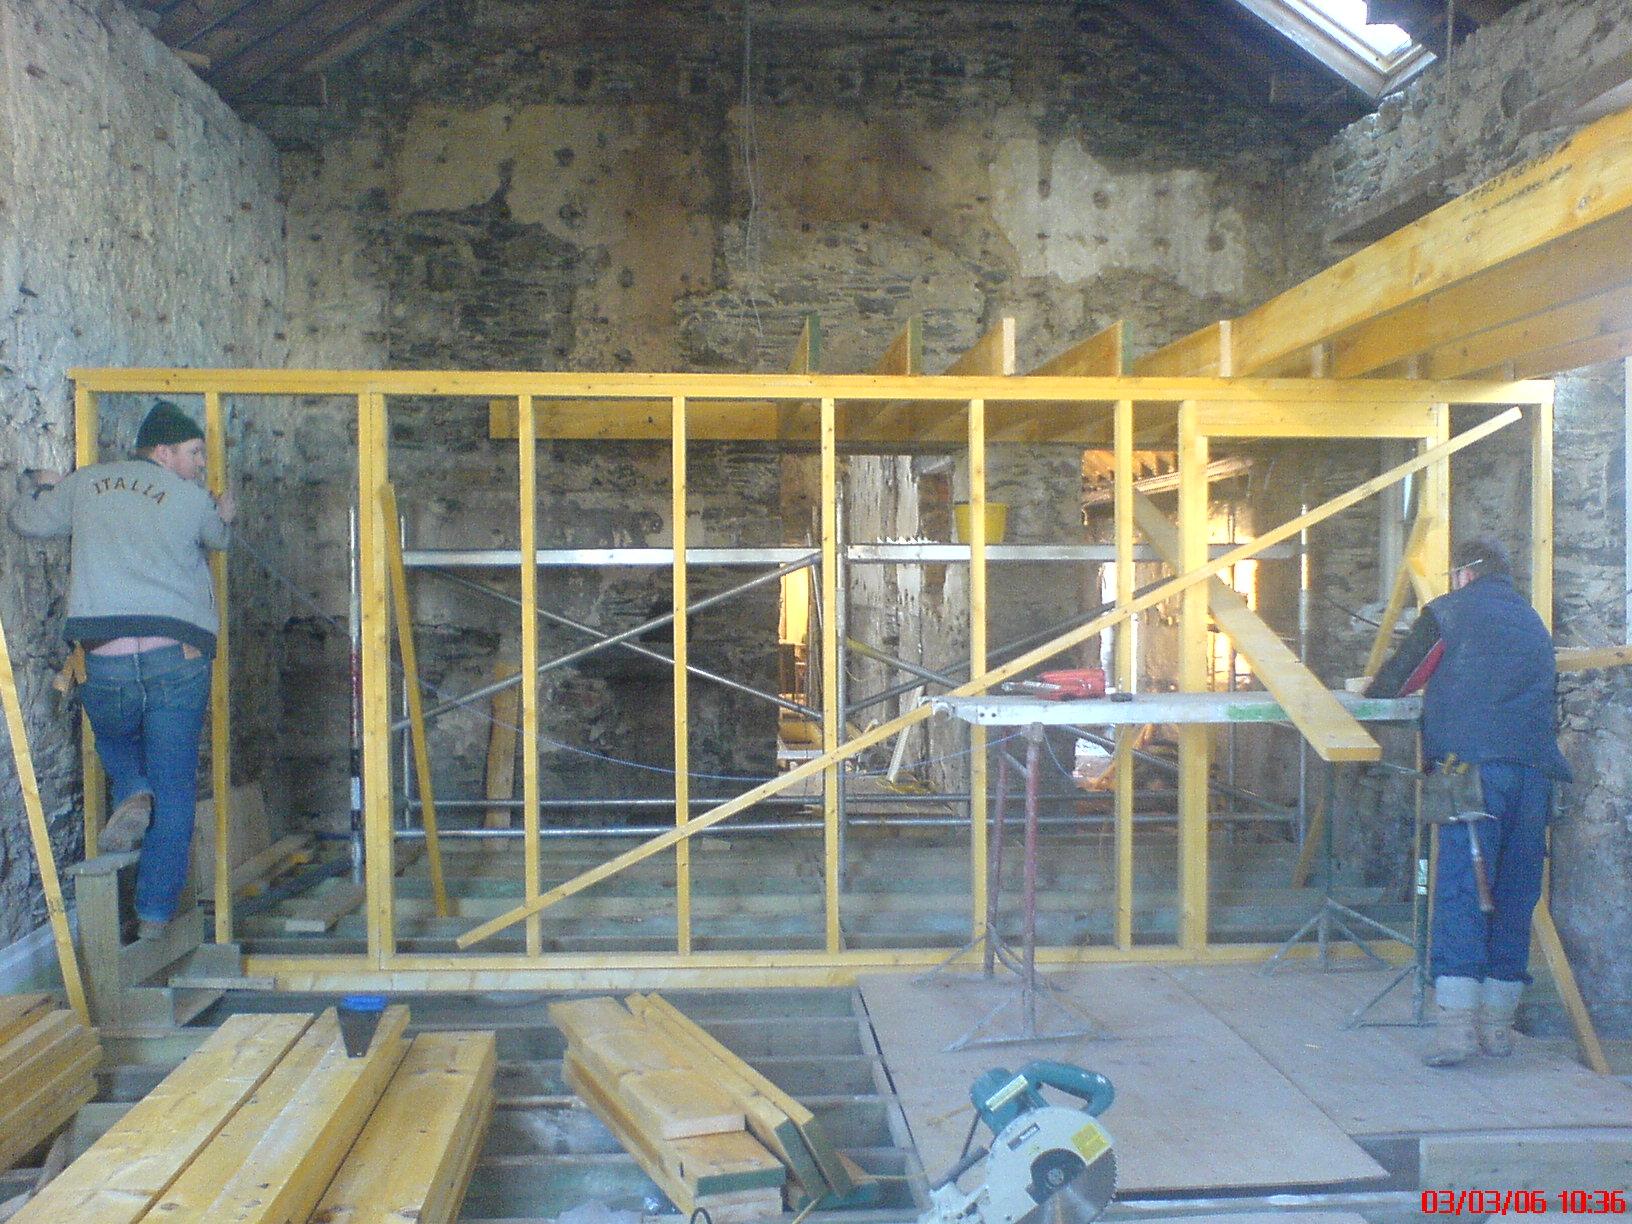 The Hall - renovations in progress